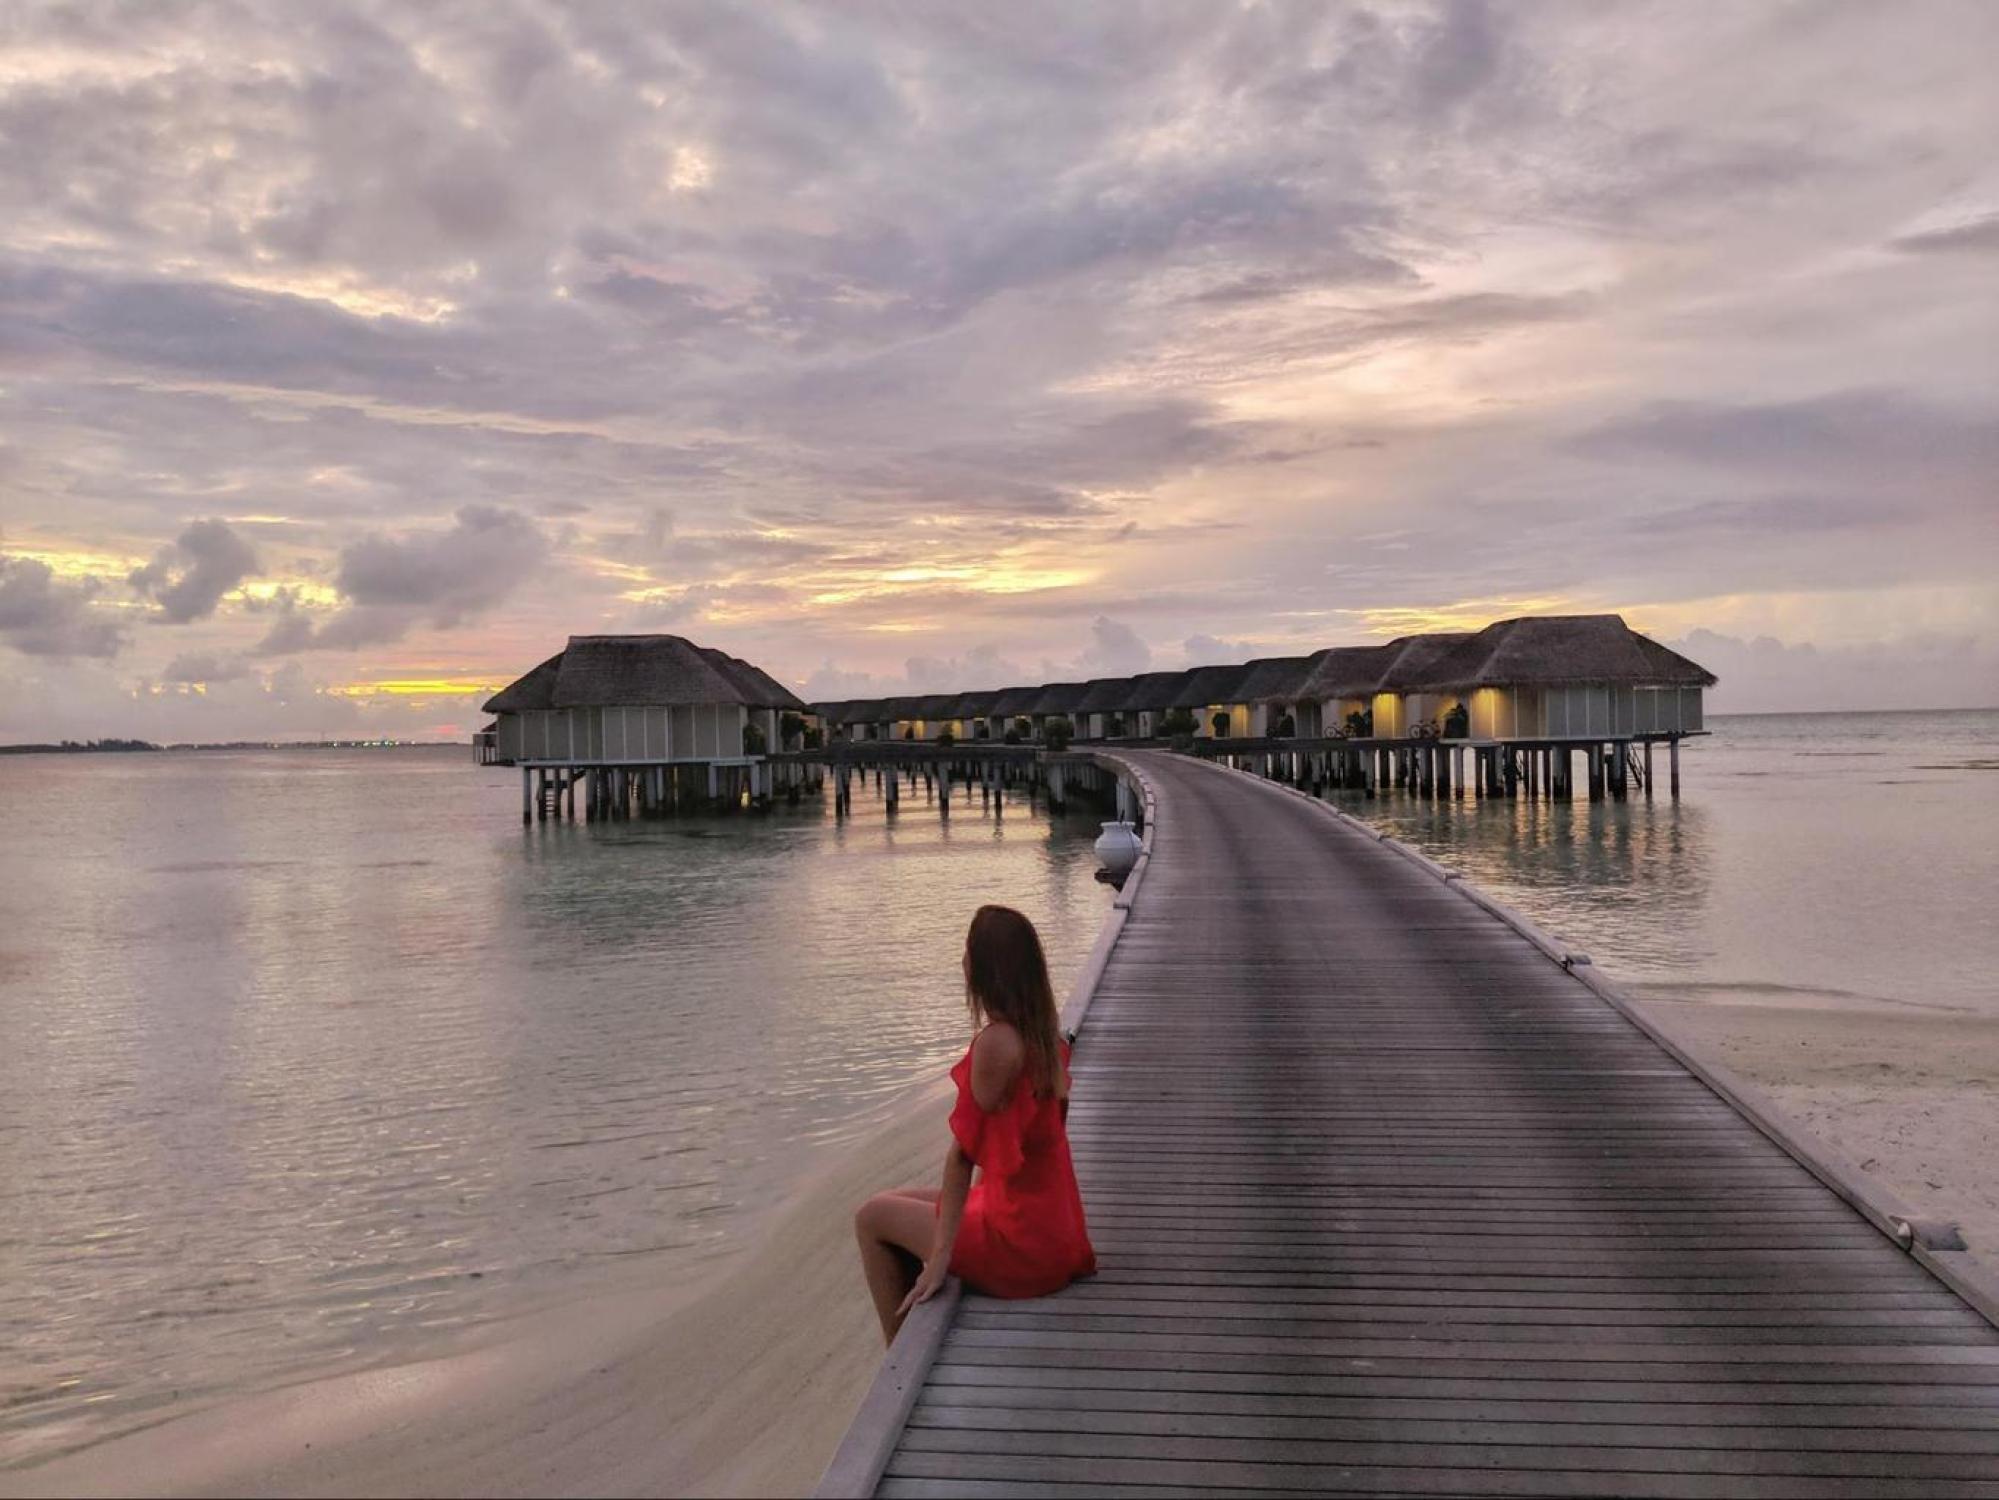 Sunset at LUX* Maldives